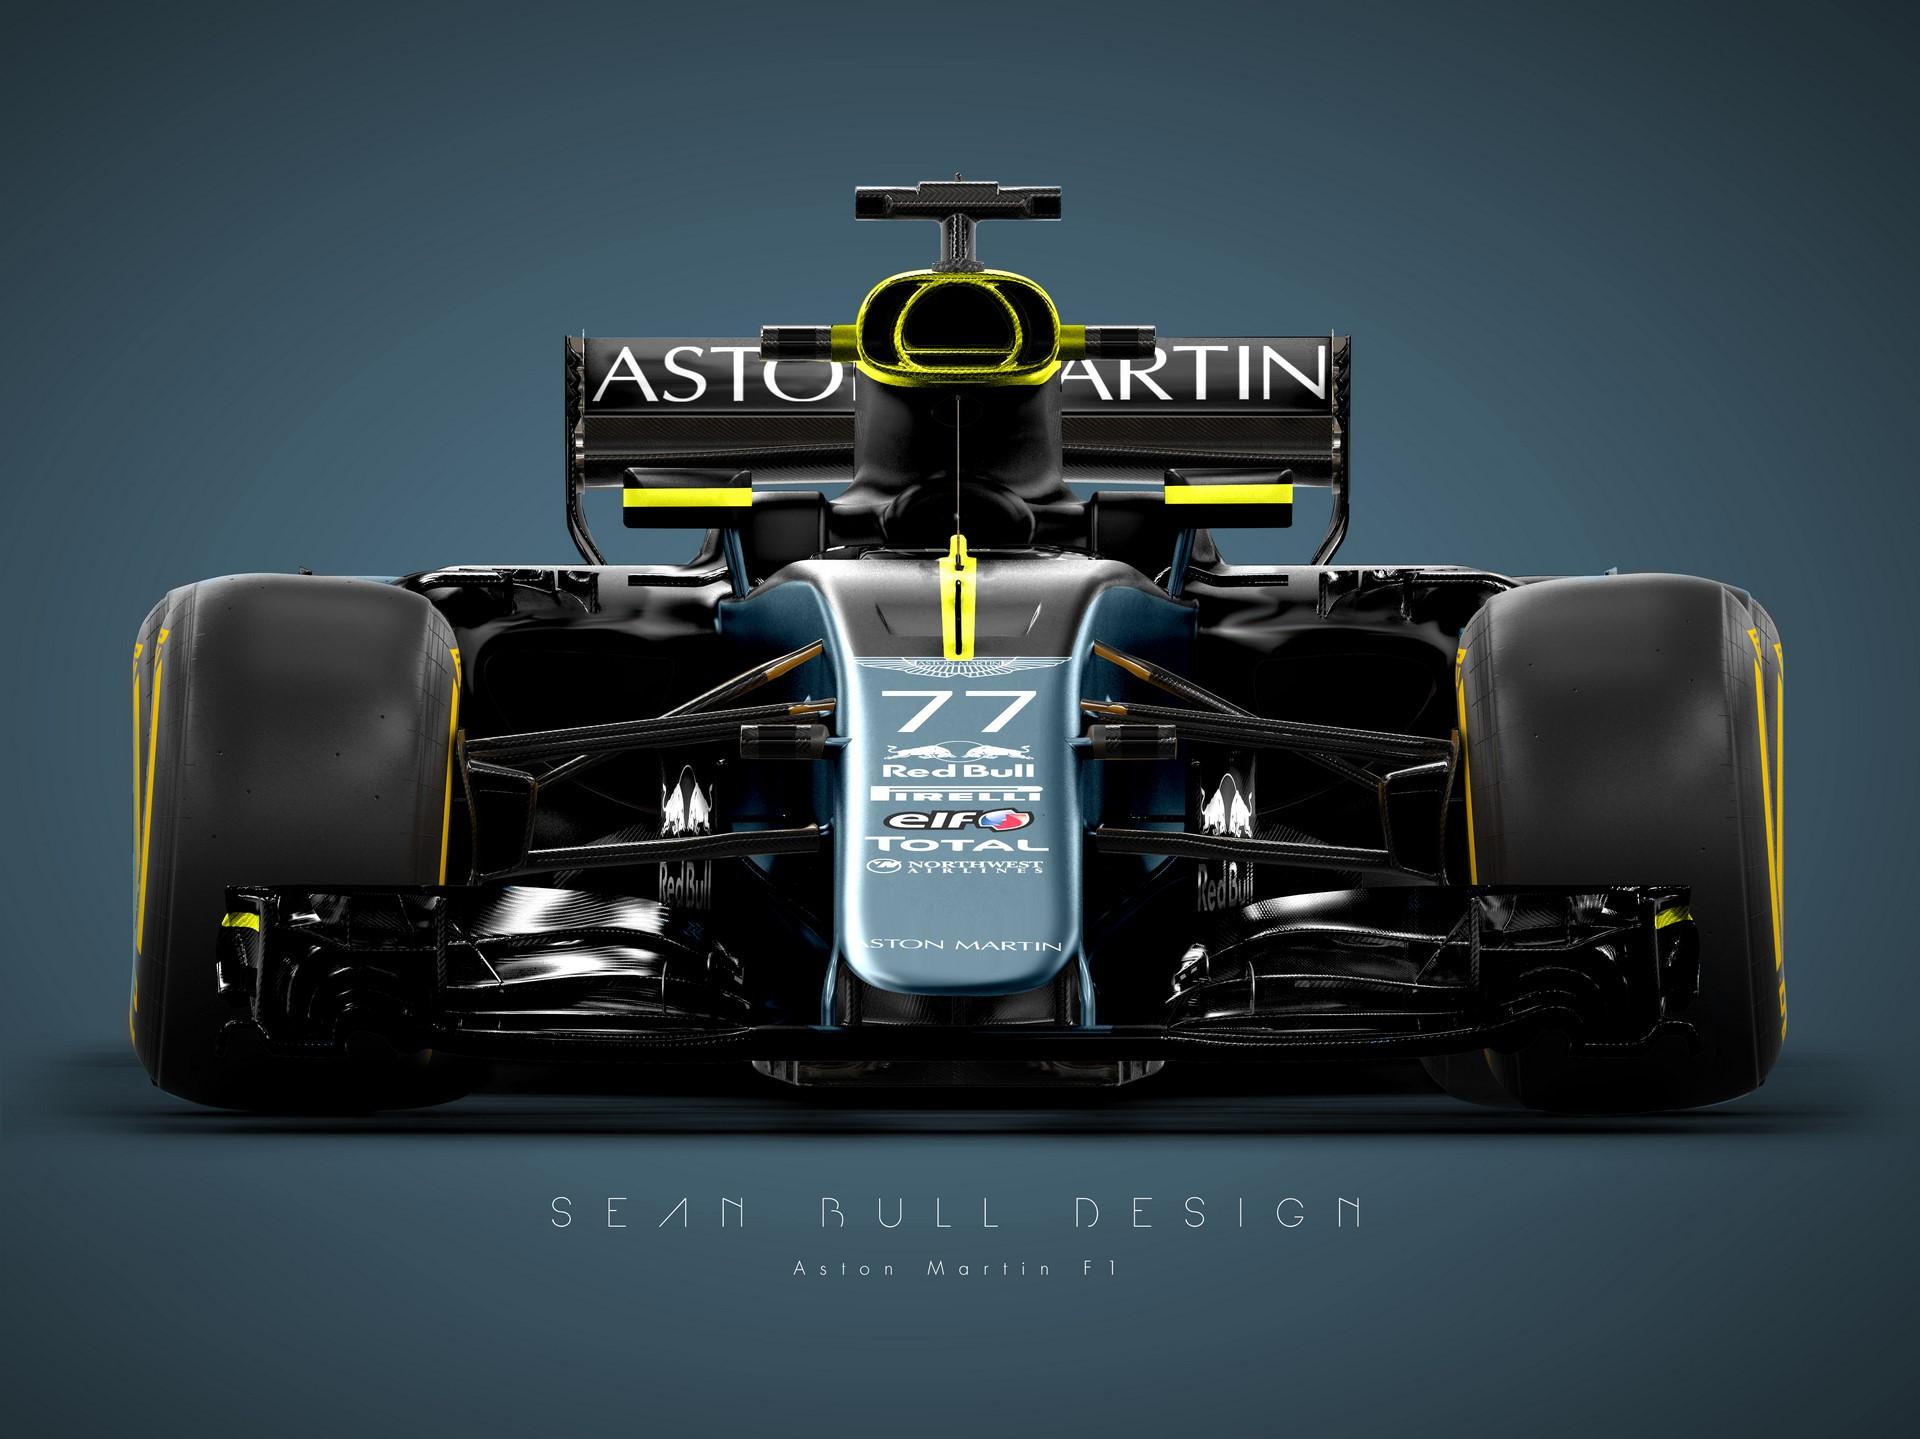 Aston Martin F1 (6)